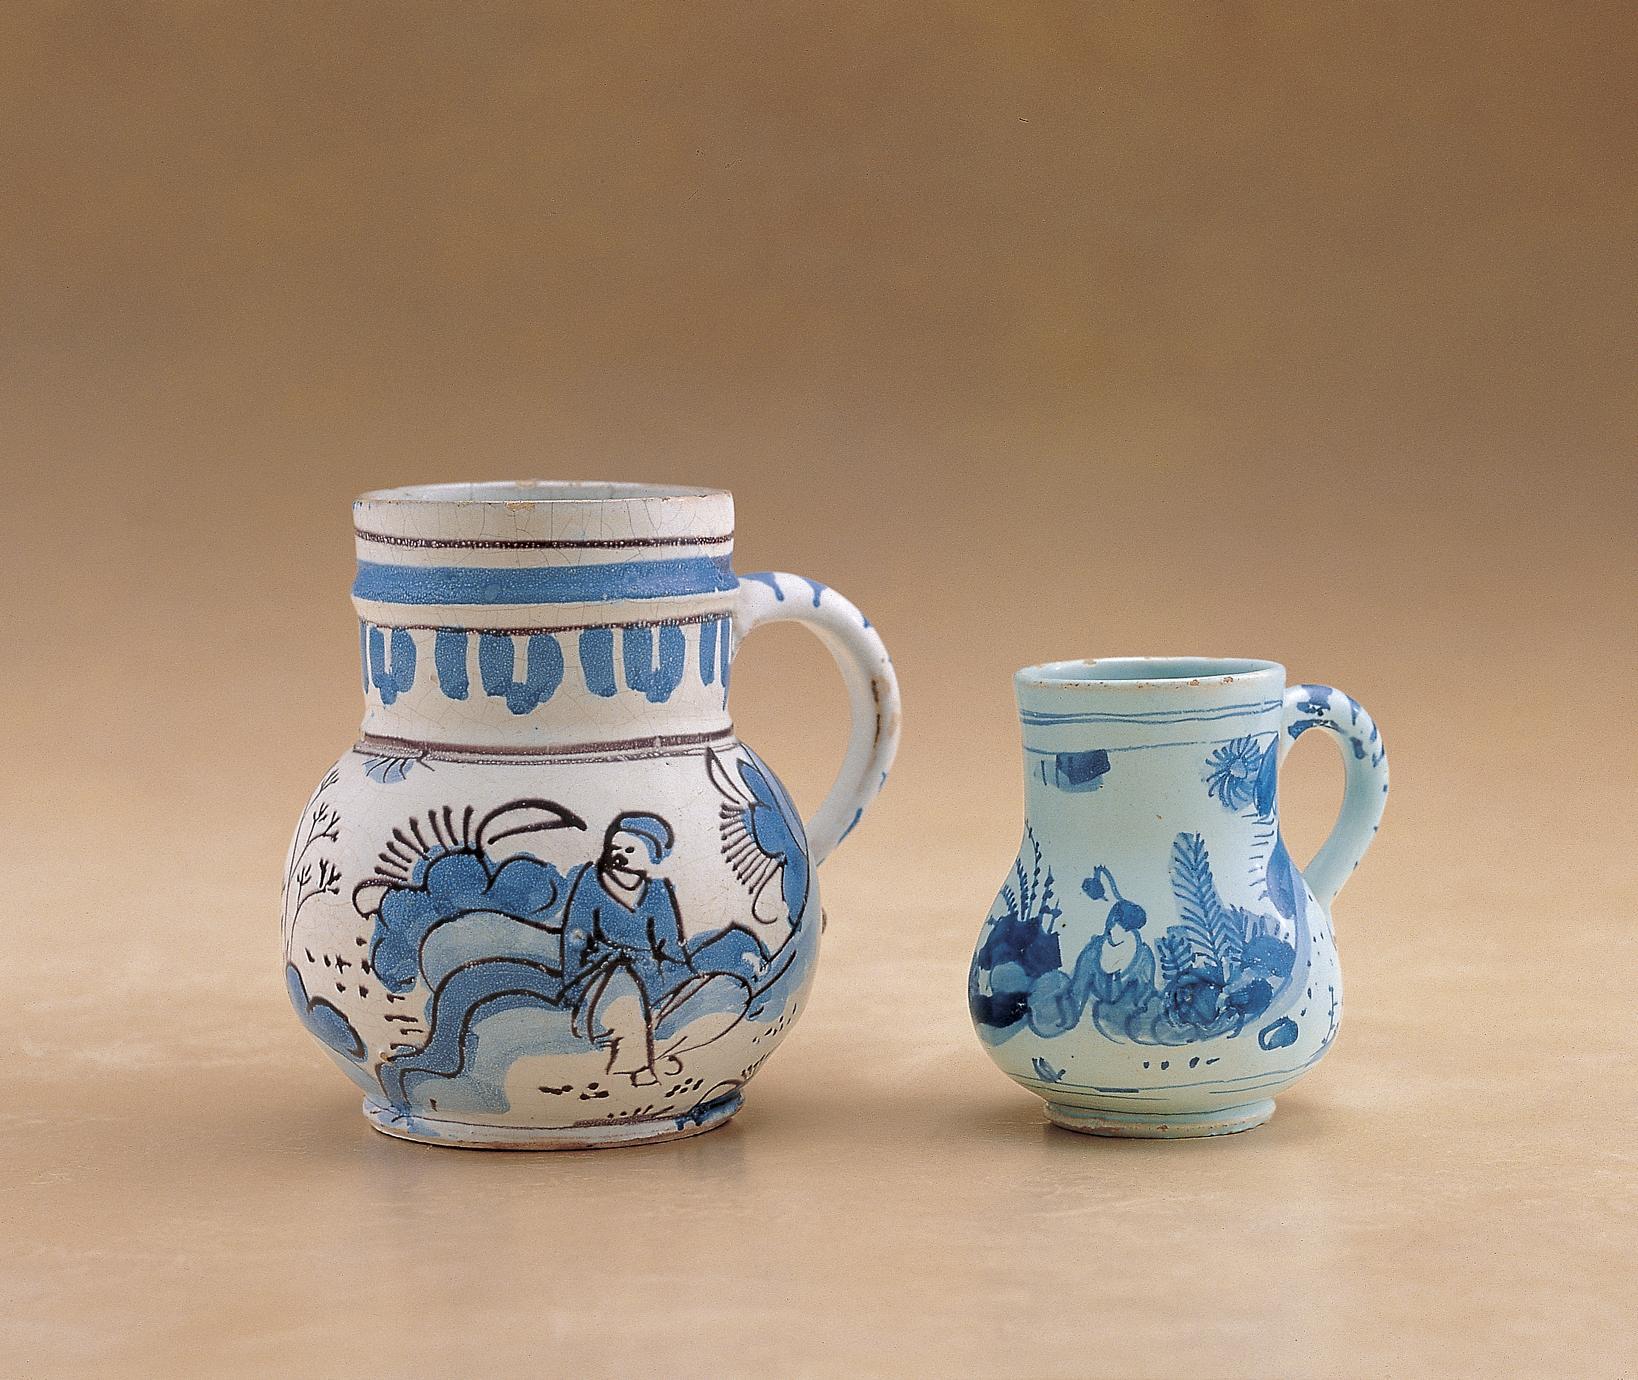 Mugs (1 of 2)